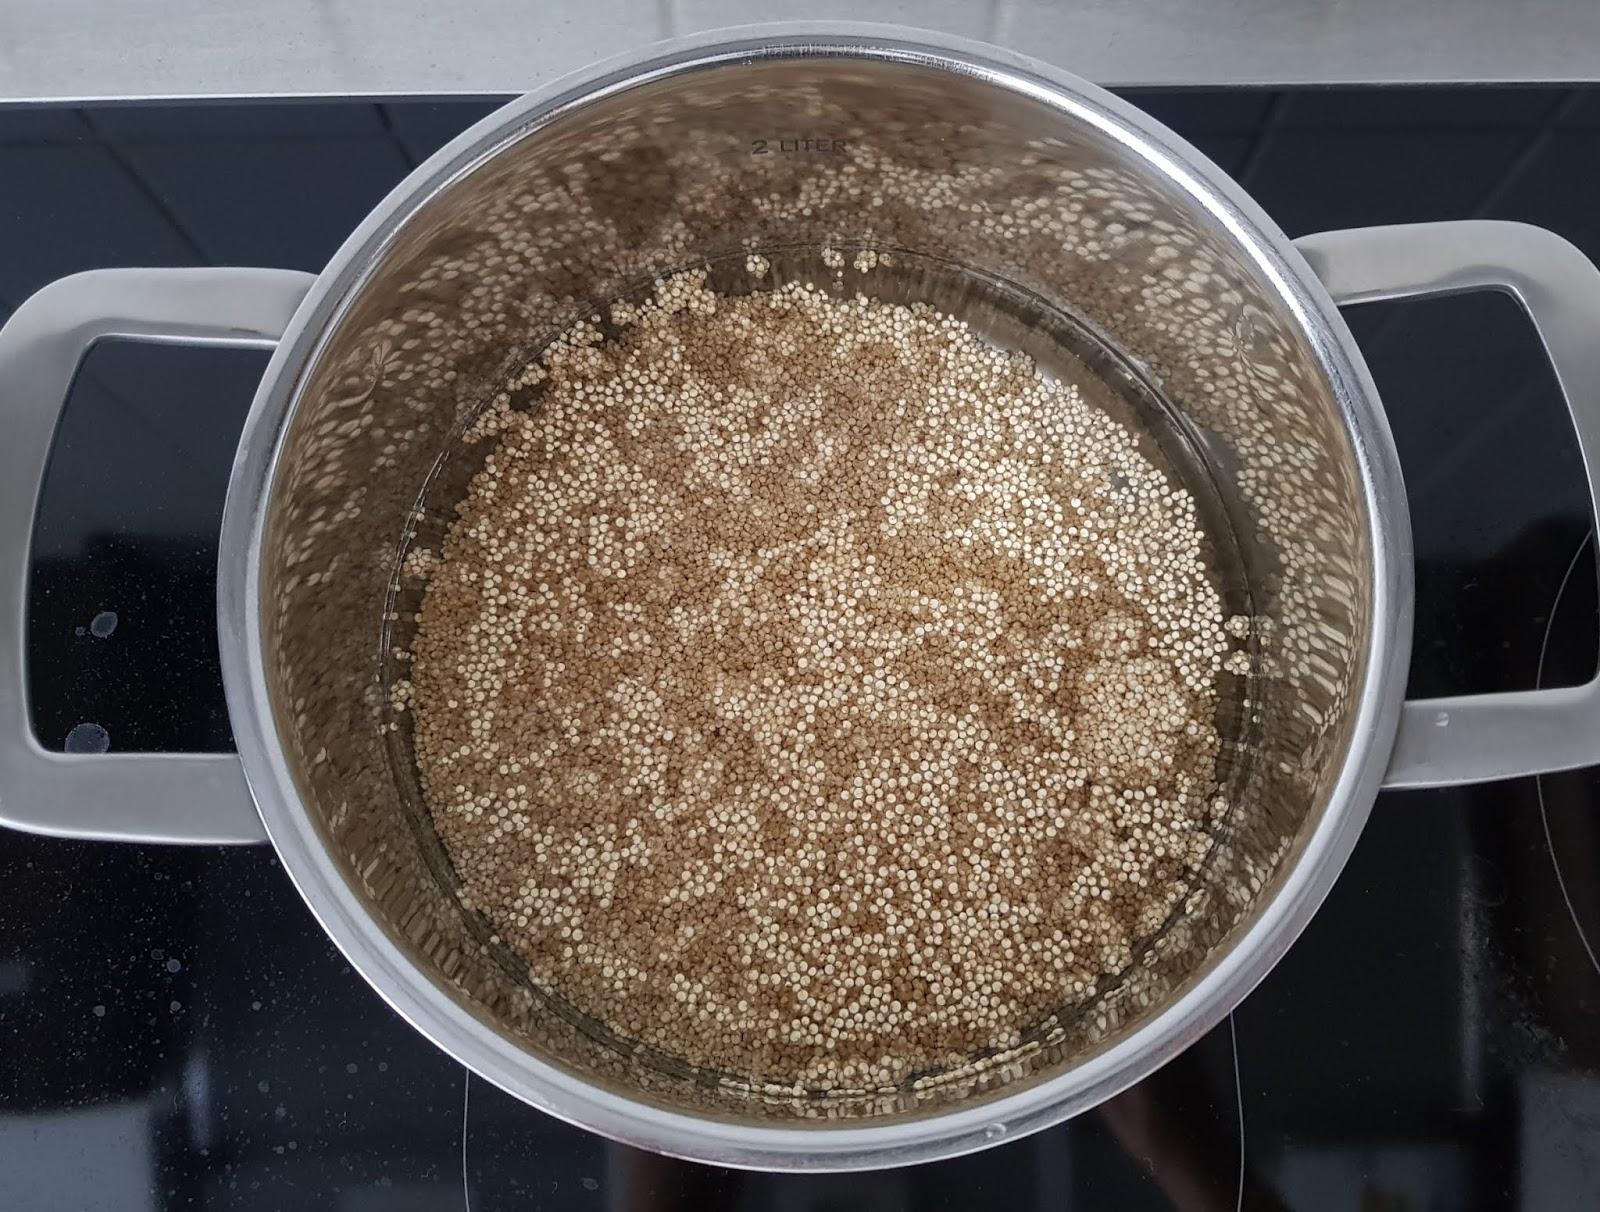 Quinoa Cutlet recipe - Vegan quinoa cutlet recipes - high protein vegan lunch step-by-step recipe